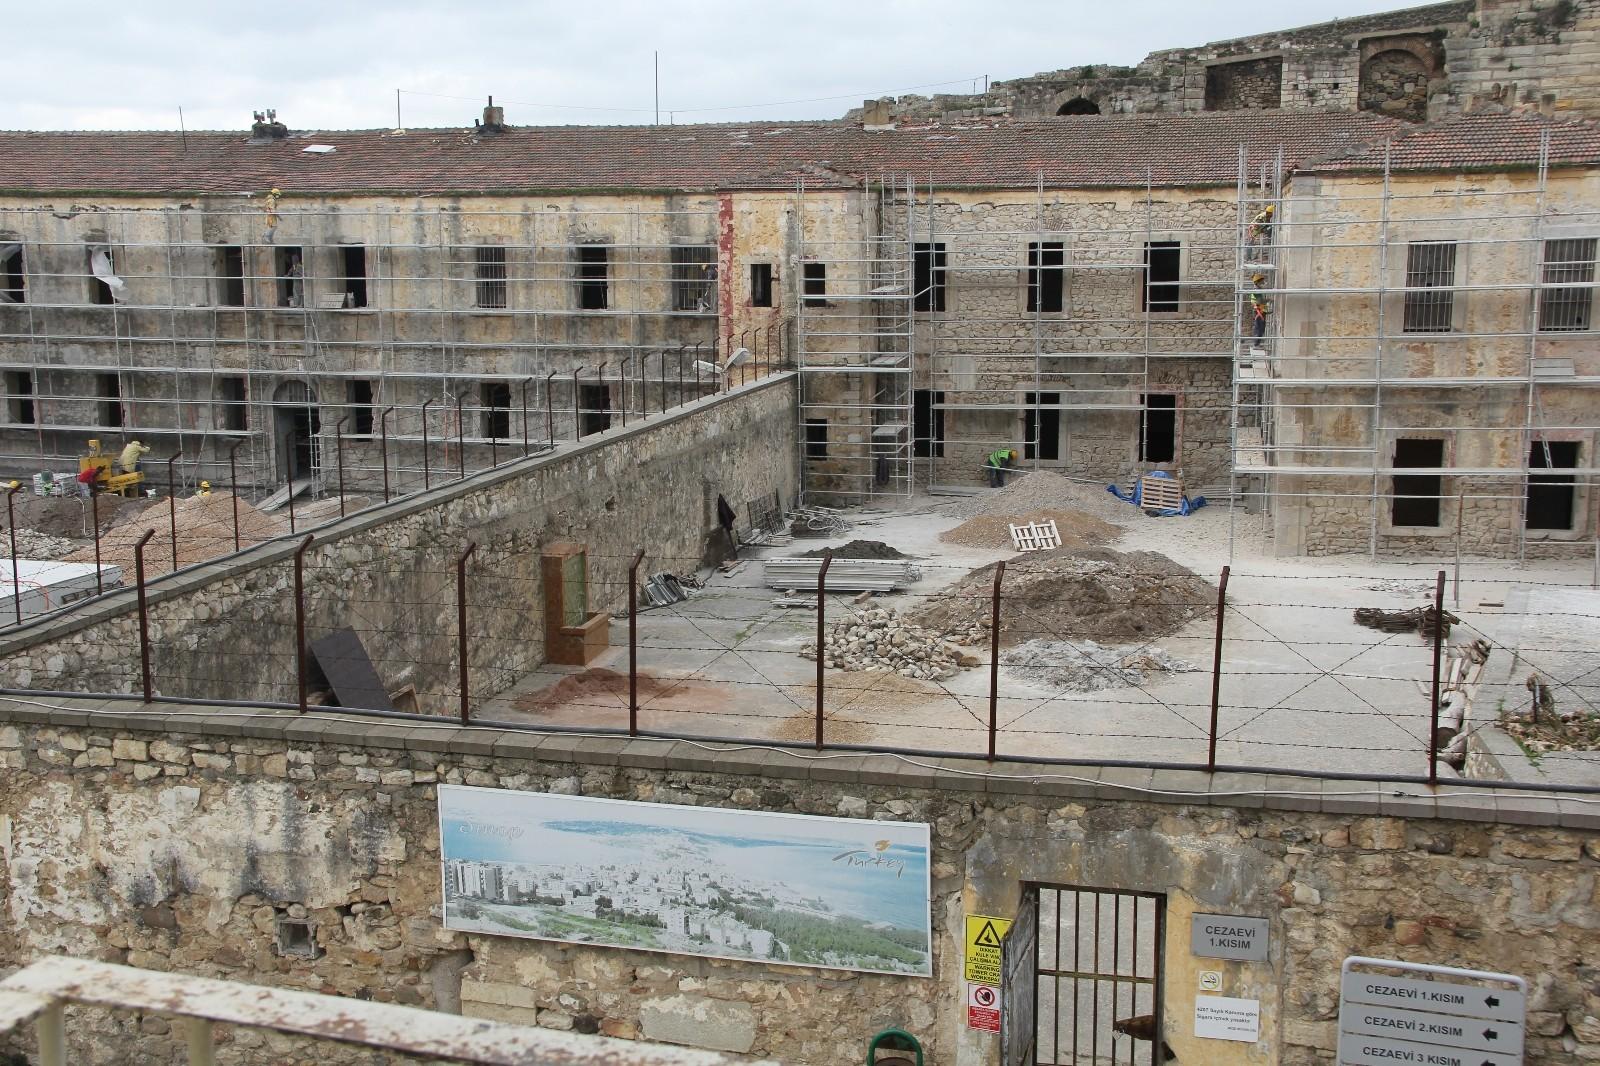 Cezaevi kapalı olan Sinop balonsuz Kapadokya gibi